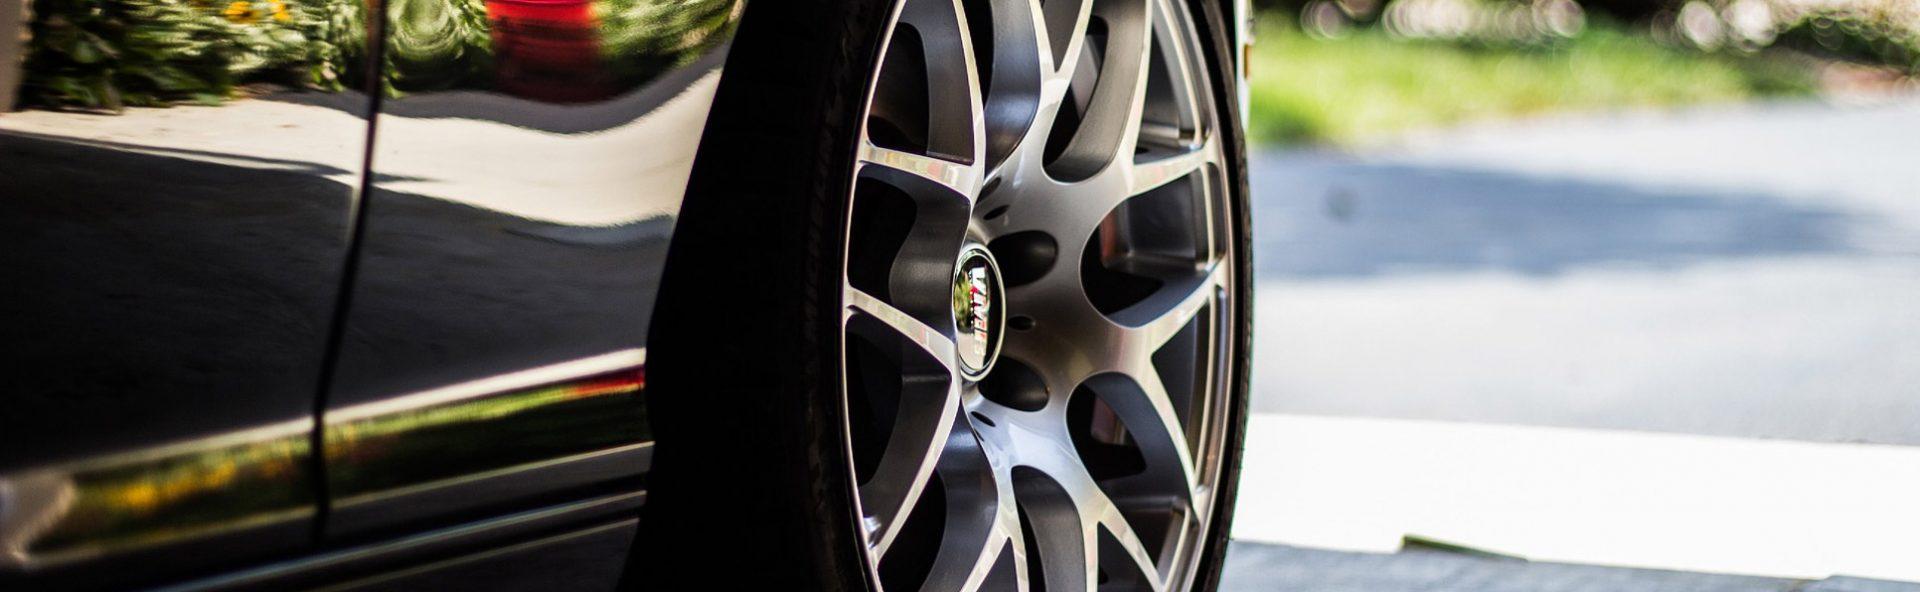 slide-pneus-01